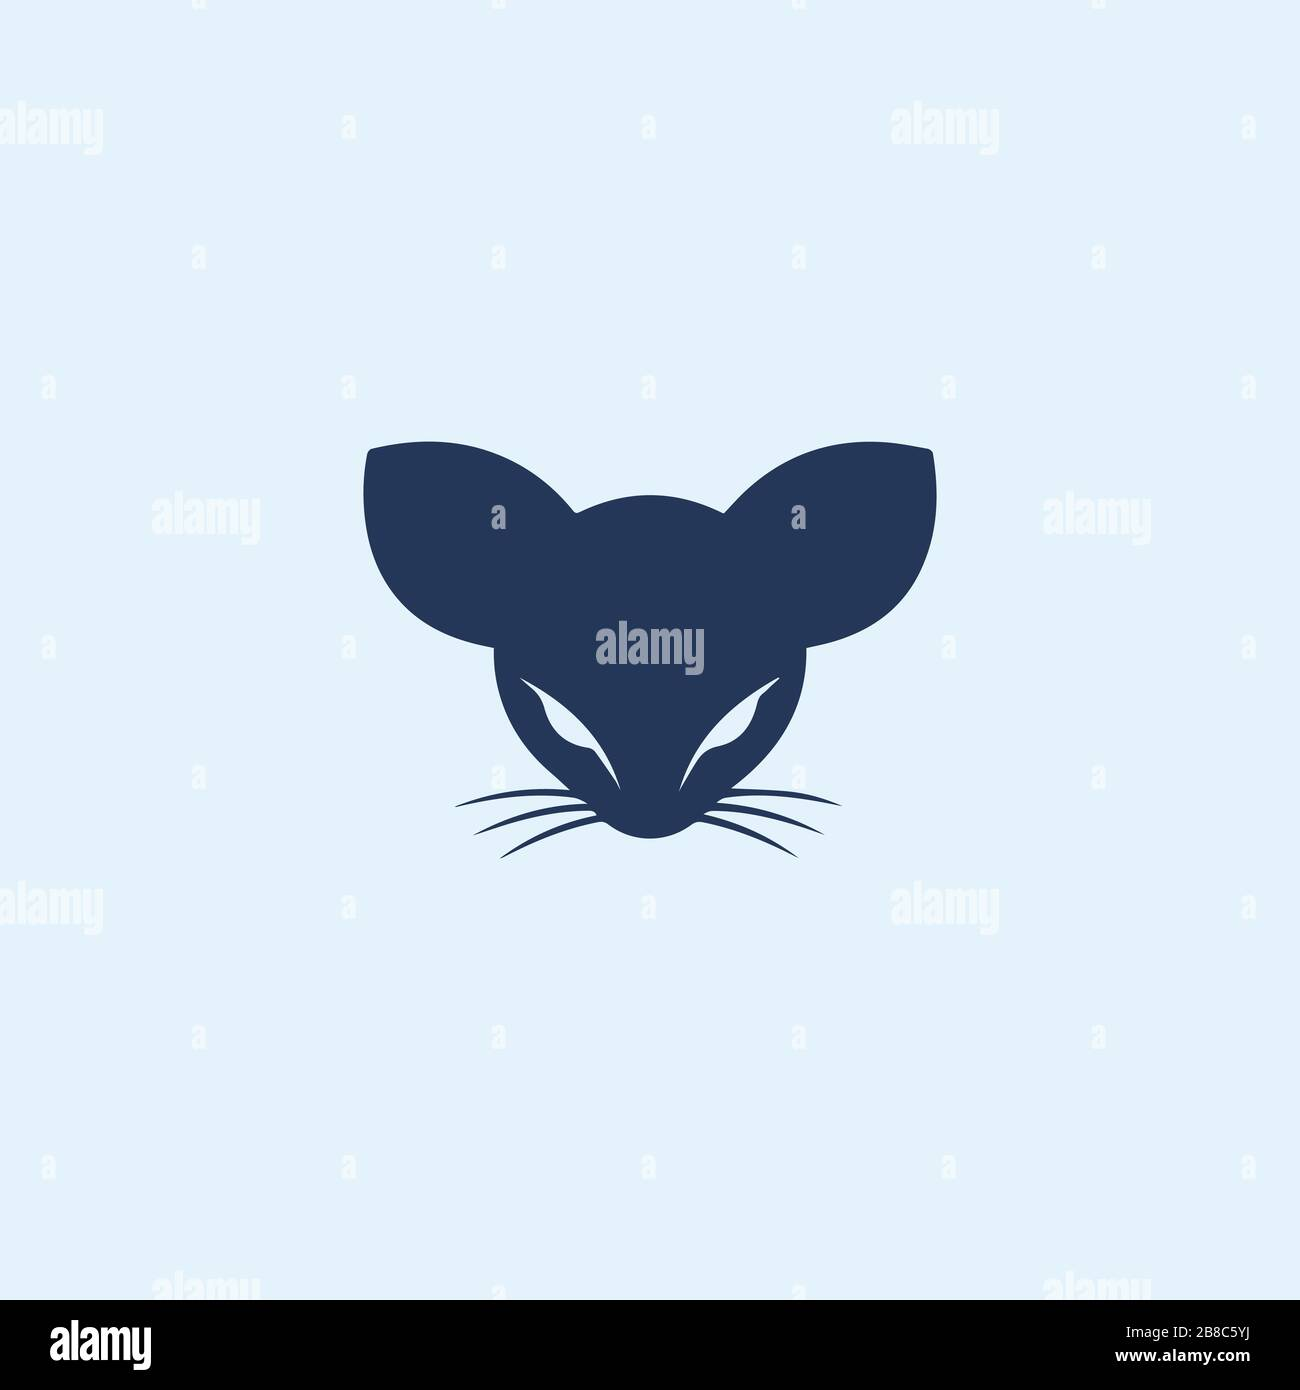 rat logo vector design template stock vector image art alamy https www alamy com rat logo vector design template image349392726 html